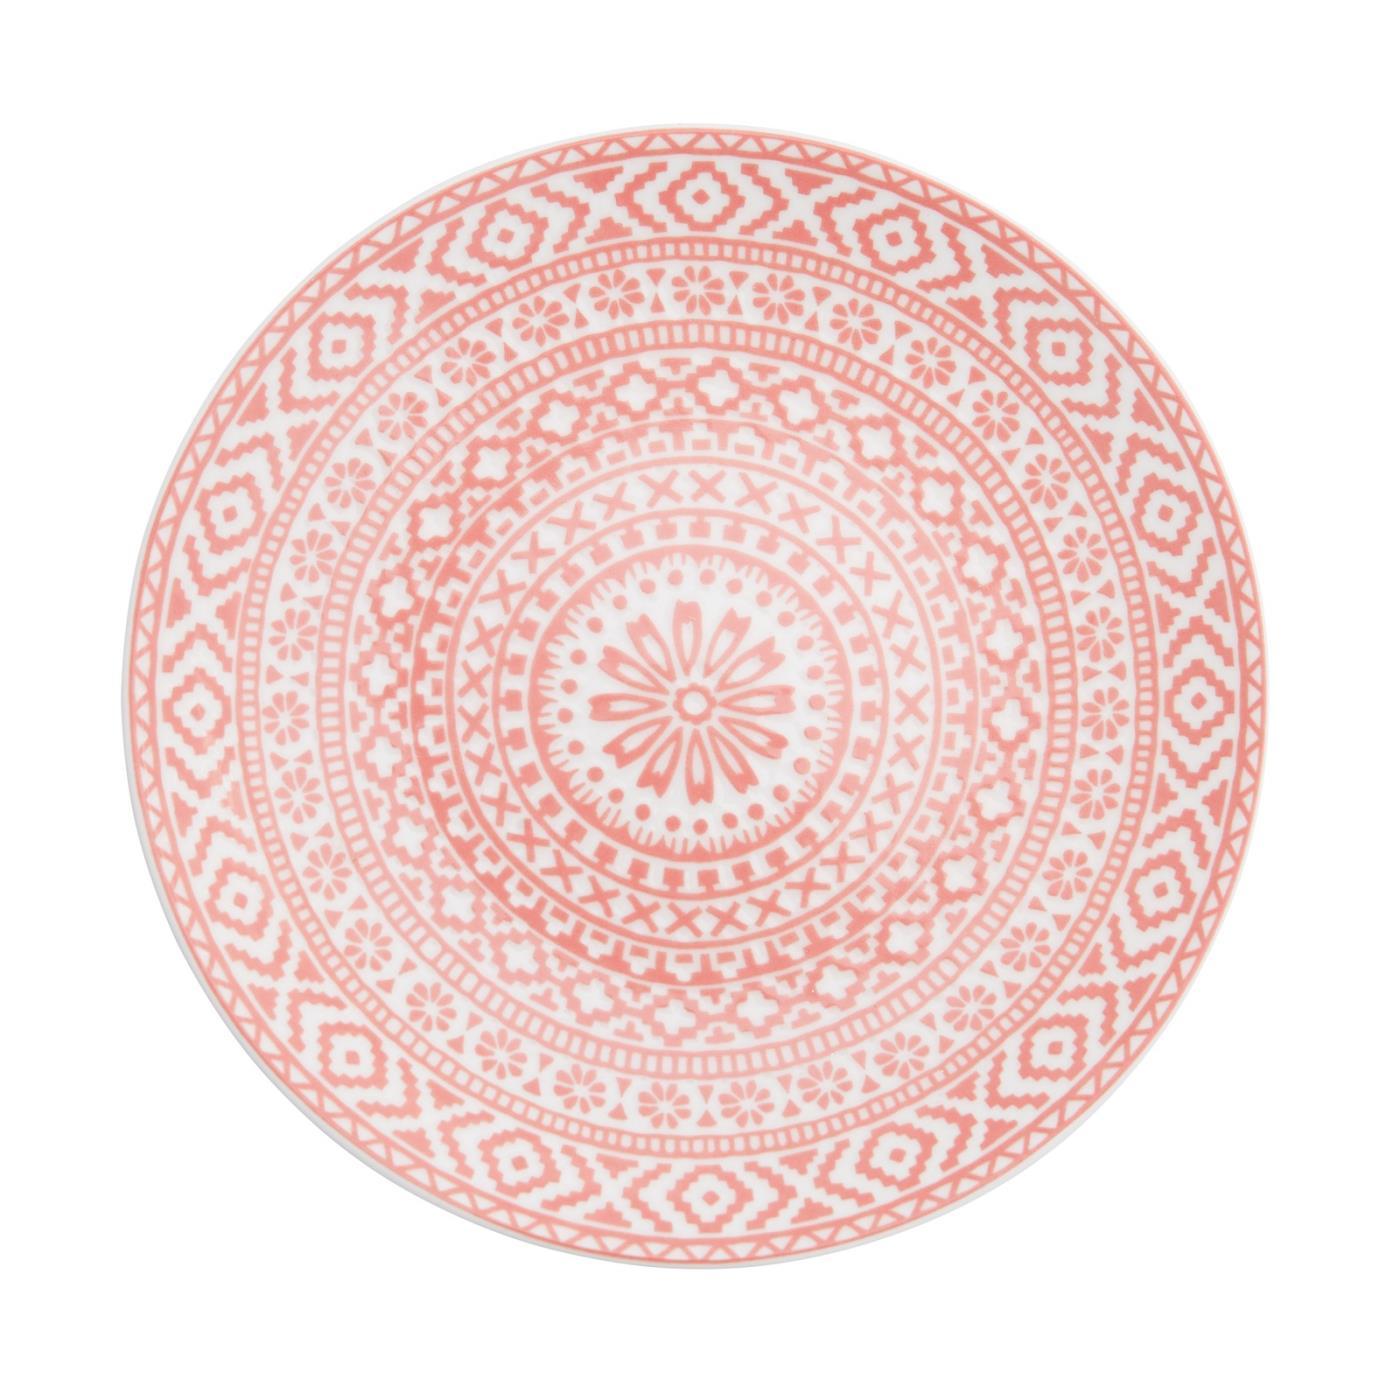 "Mayan Plate 8"" - Coral"